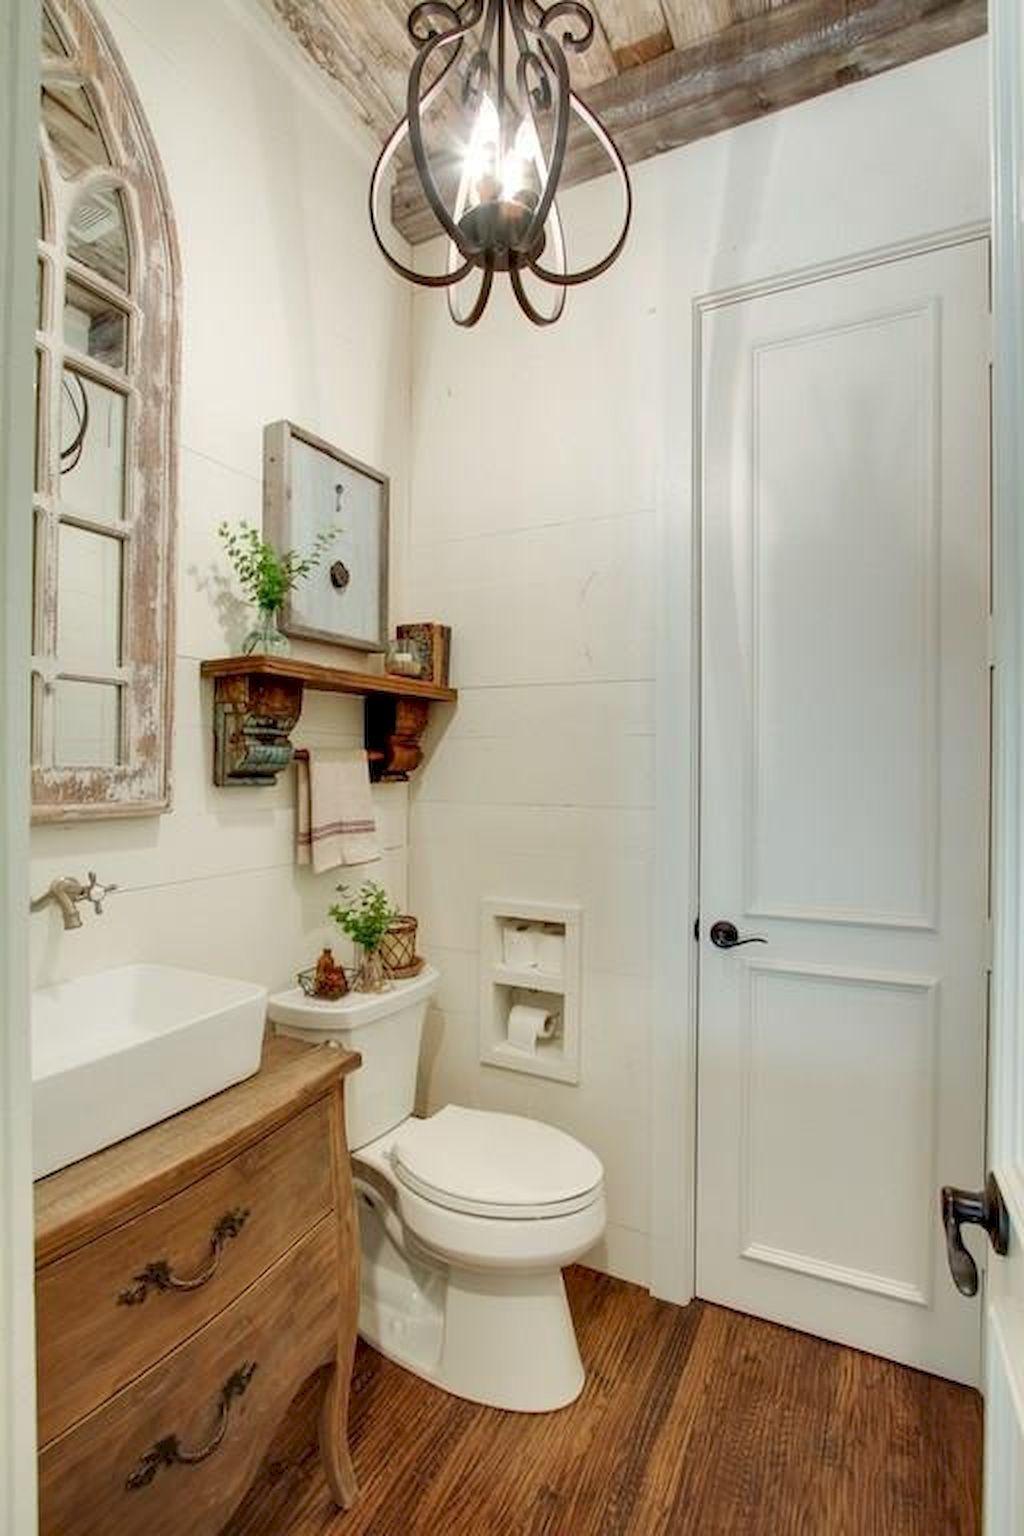 Épinglé sur bathroom